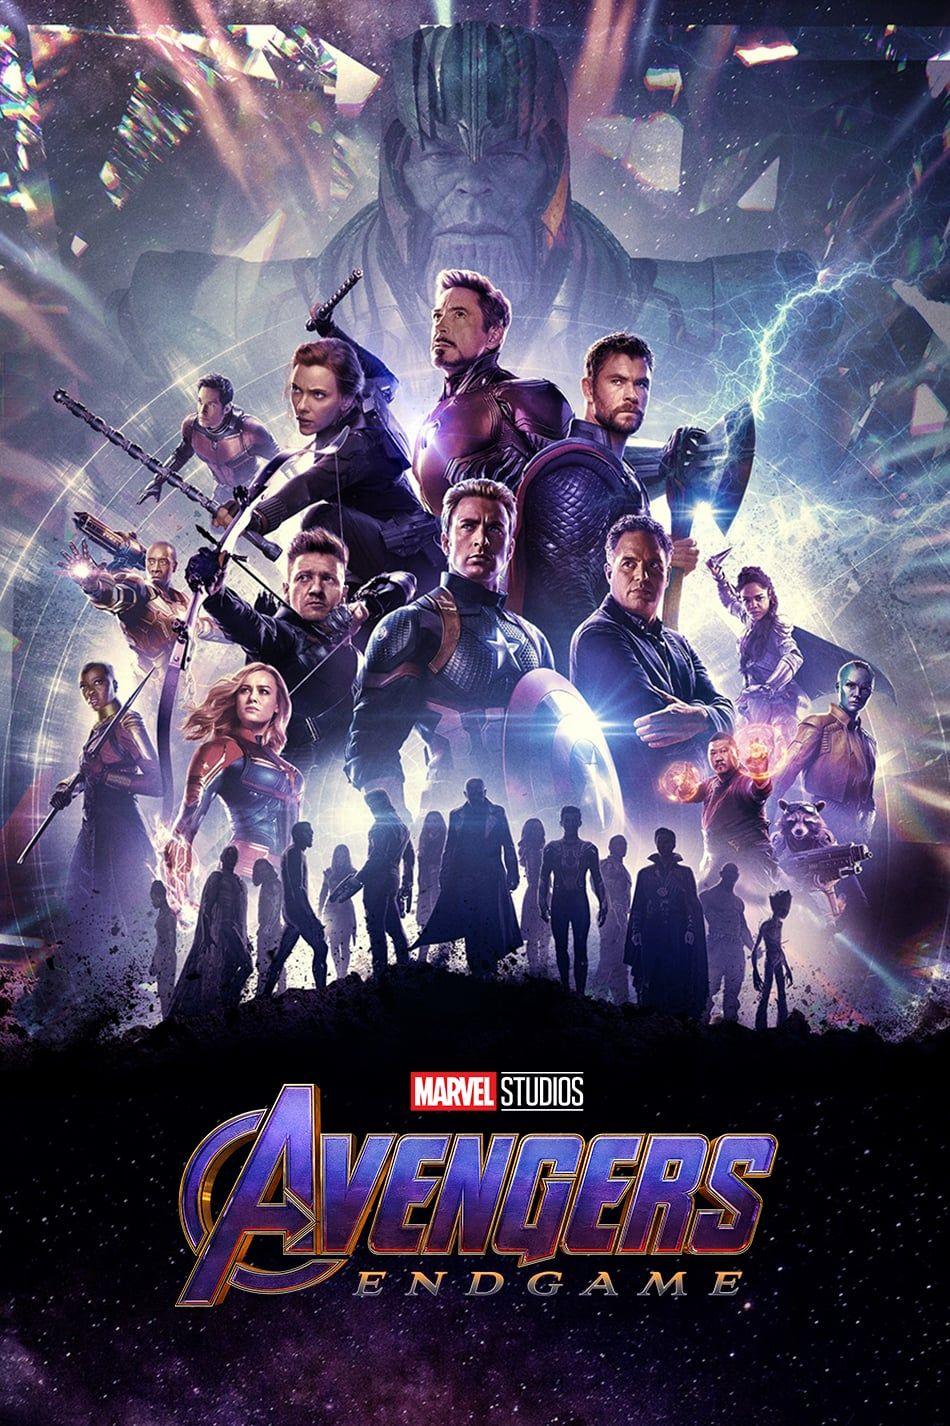 Ver Vengadores Endgame Película Completa En Español Latino 1080p Marvel Superheroes Marvel Wallpaper Marvel Background